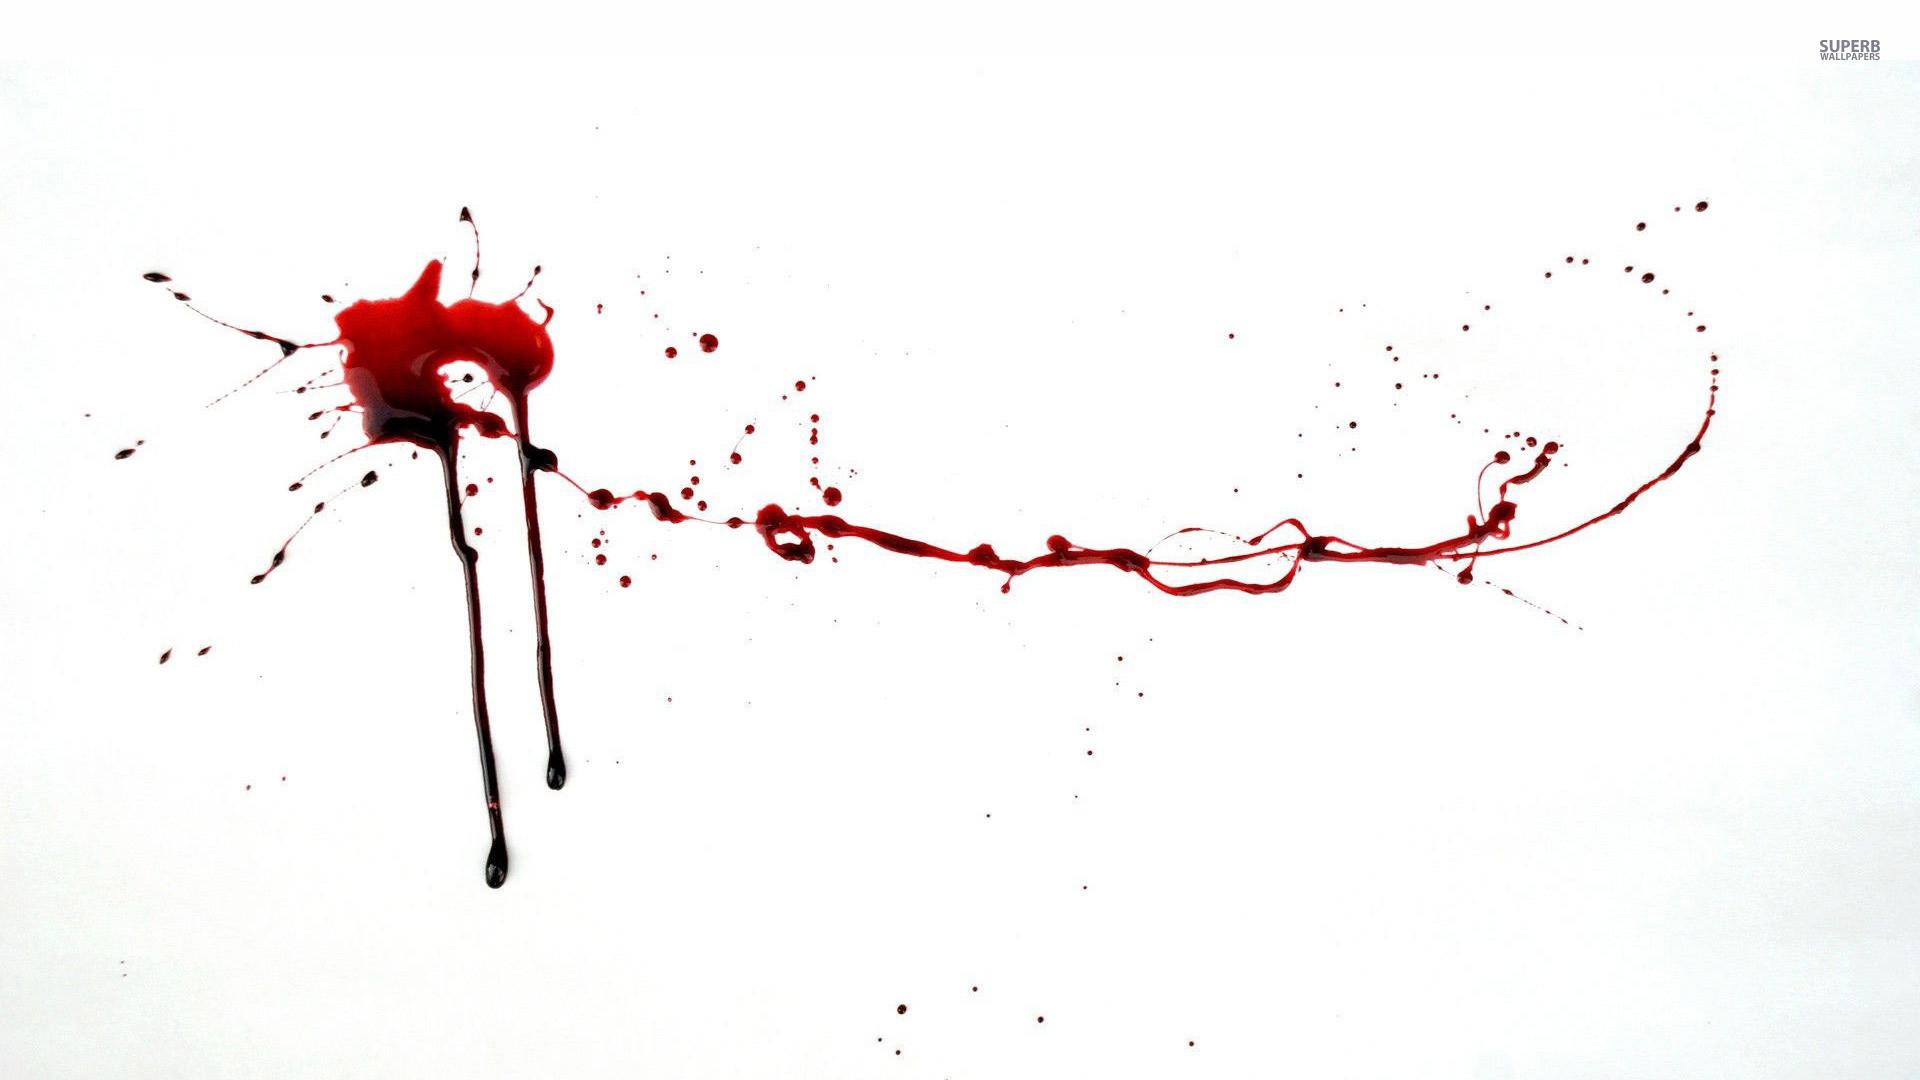 Blood Spatter Wallpaper 1920×1080